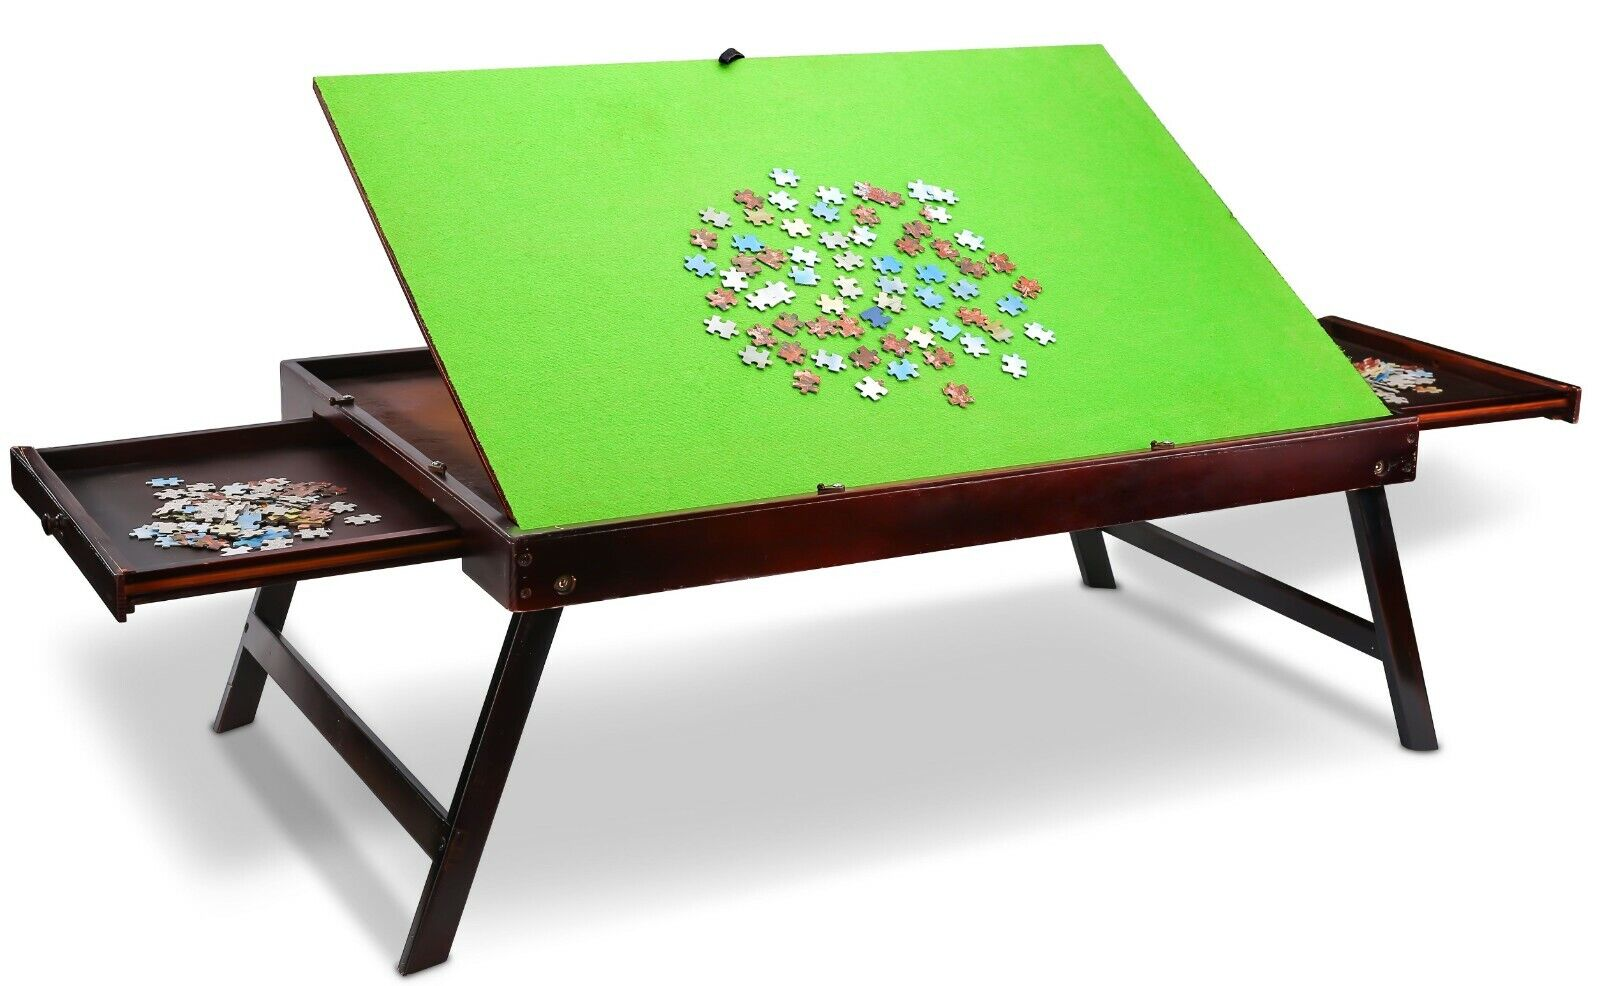 Jigsaw Puzzle Storage Folding Tilting Drawer Table 1500 1000 Pcs